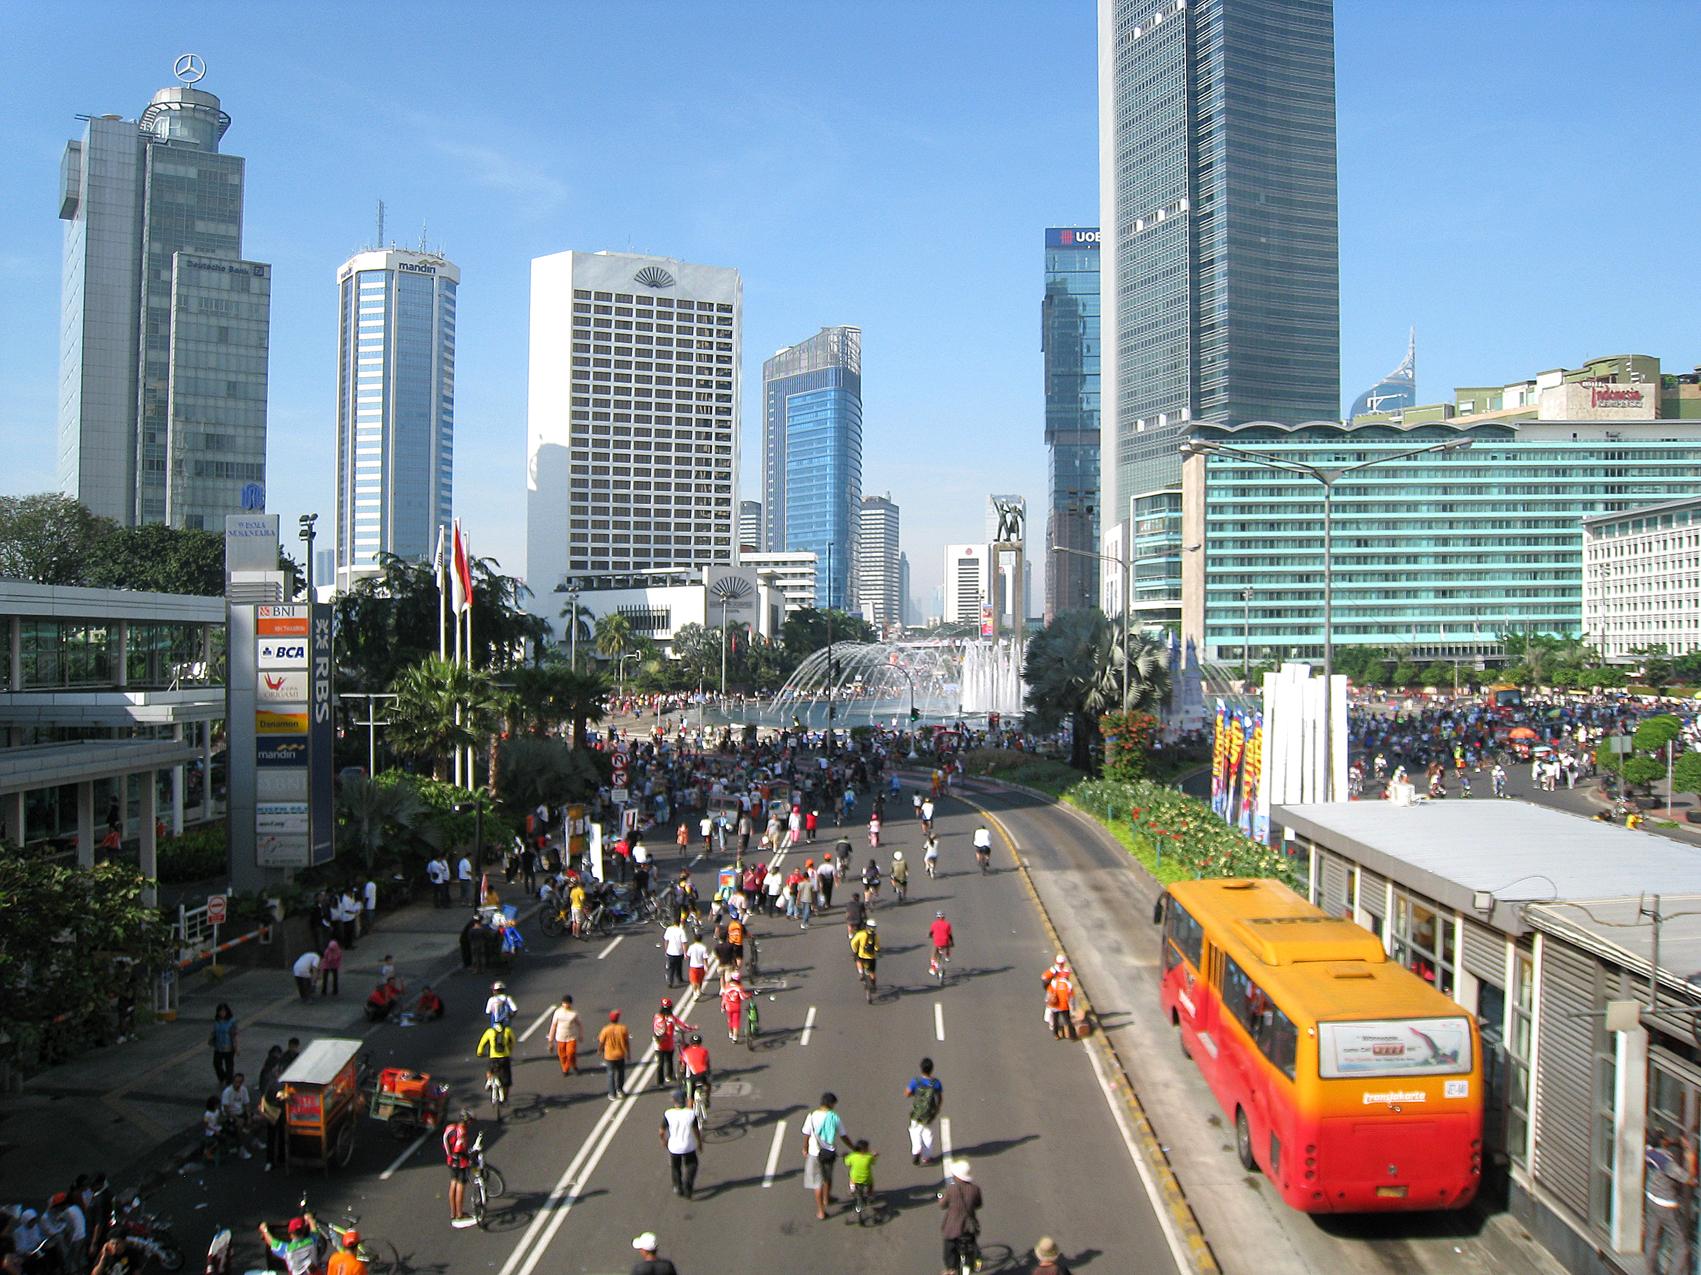 <p> Para pejalan kaki yang sedang menikmati Car Free Day di kota Jakarta. Foto oleh Gunawan Karya Pranata / Wikimedia Commons.</p>